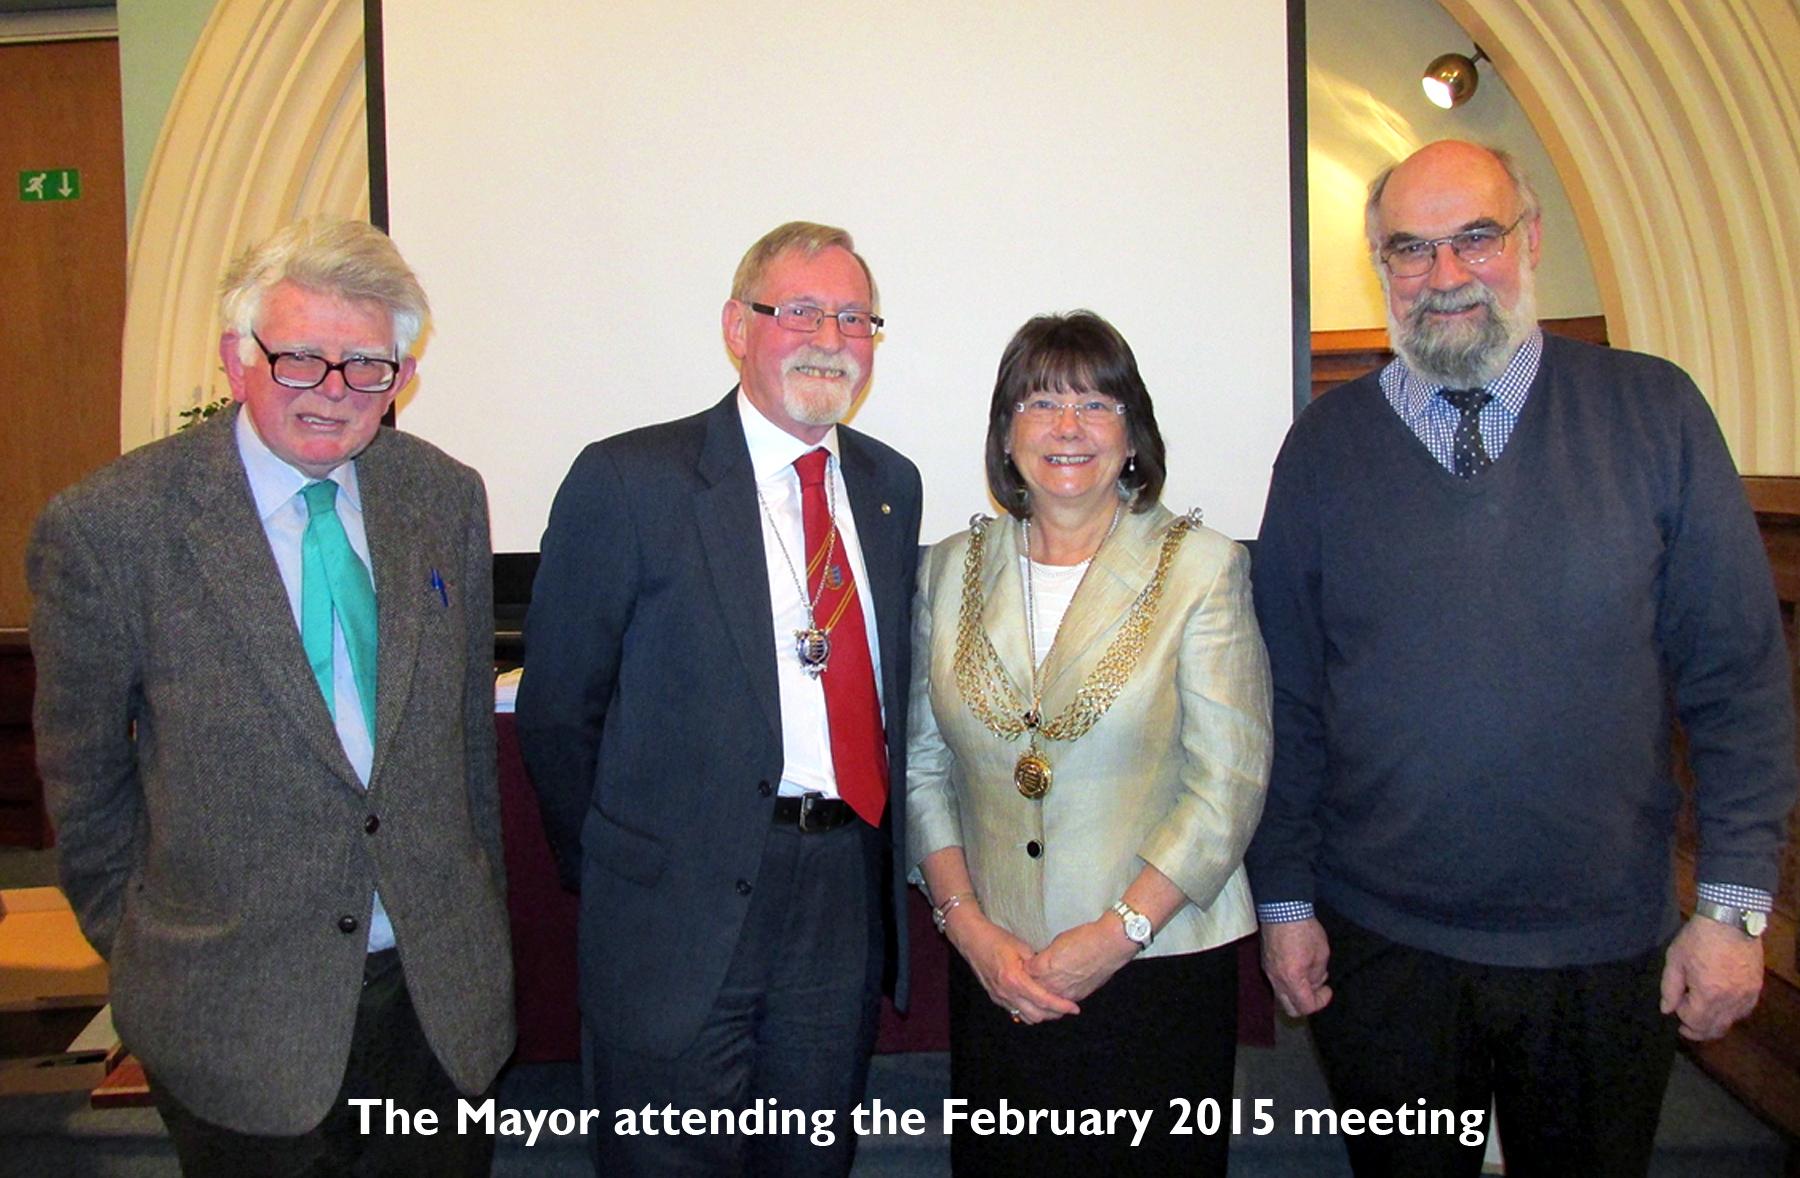 Mayor attends Feb 2015 Meeting